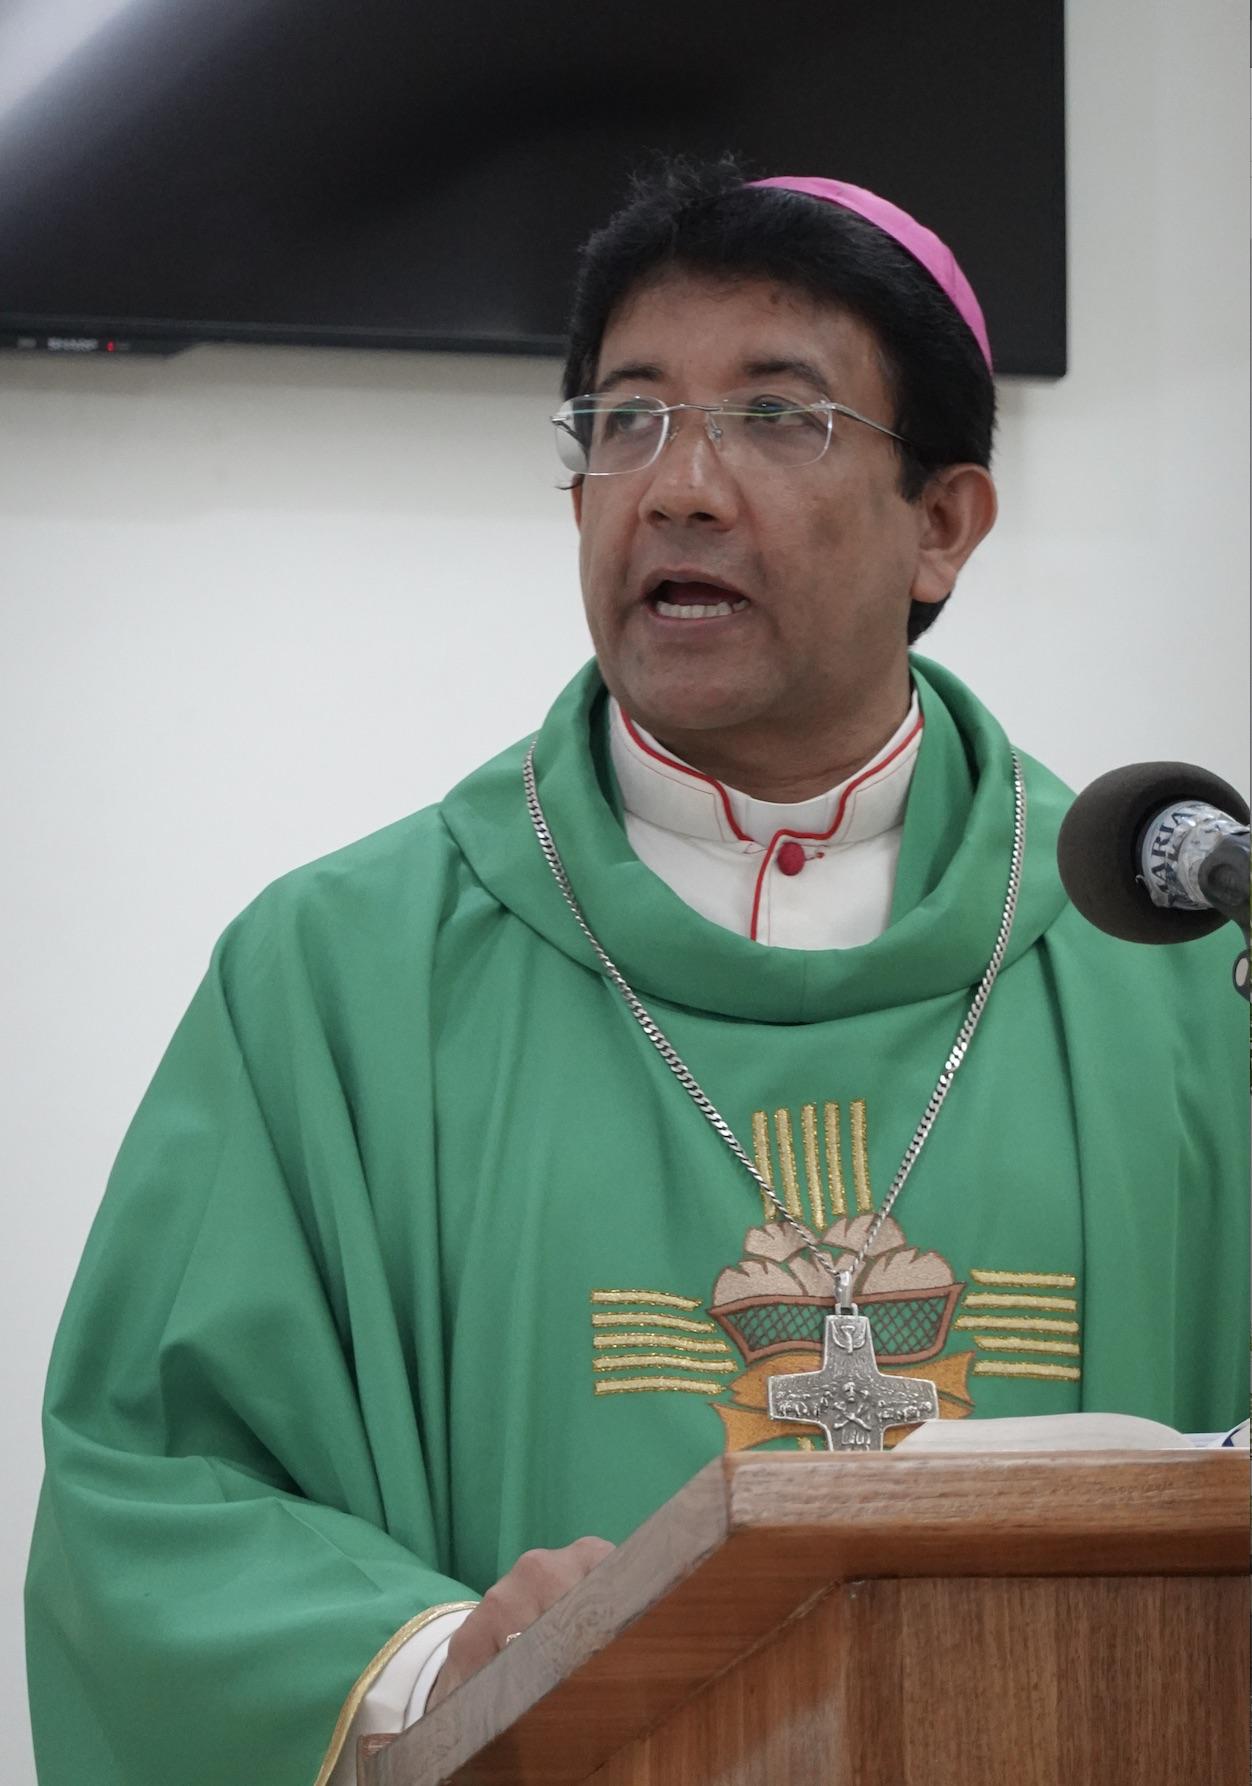 Apostolic Nuncio 2